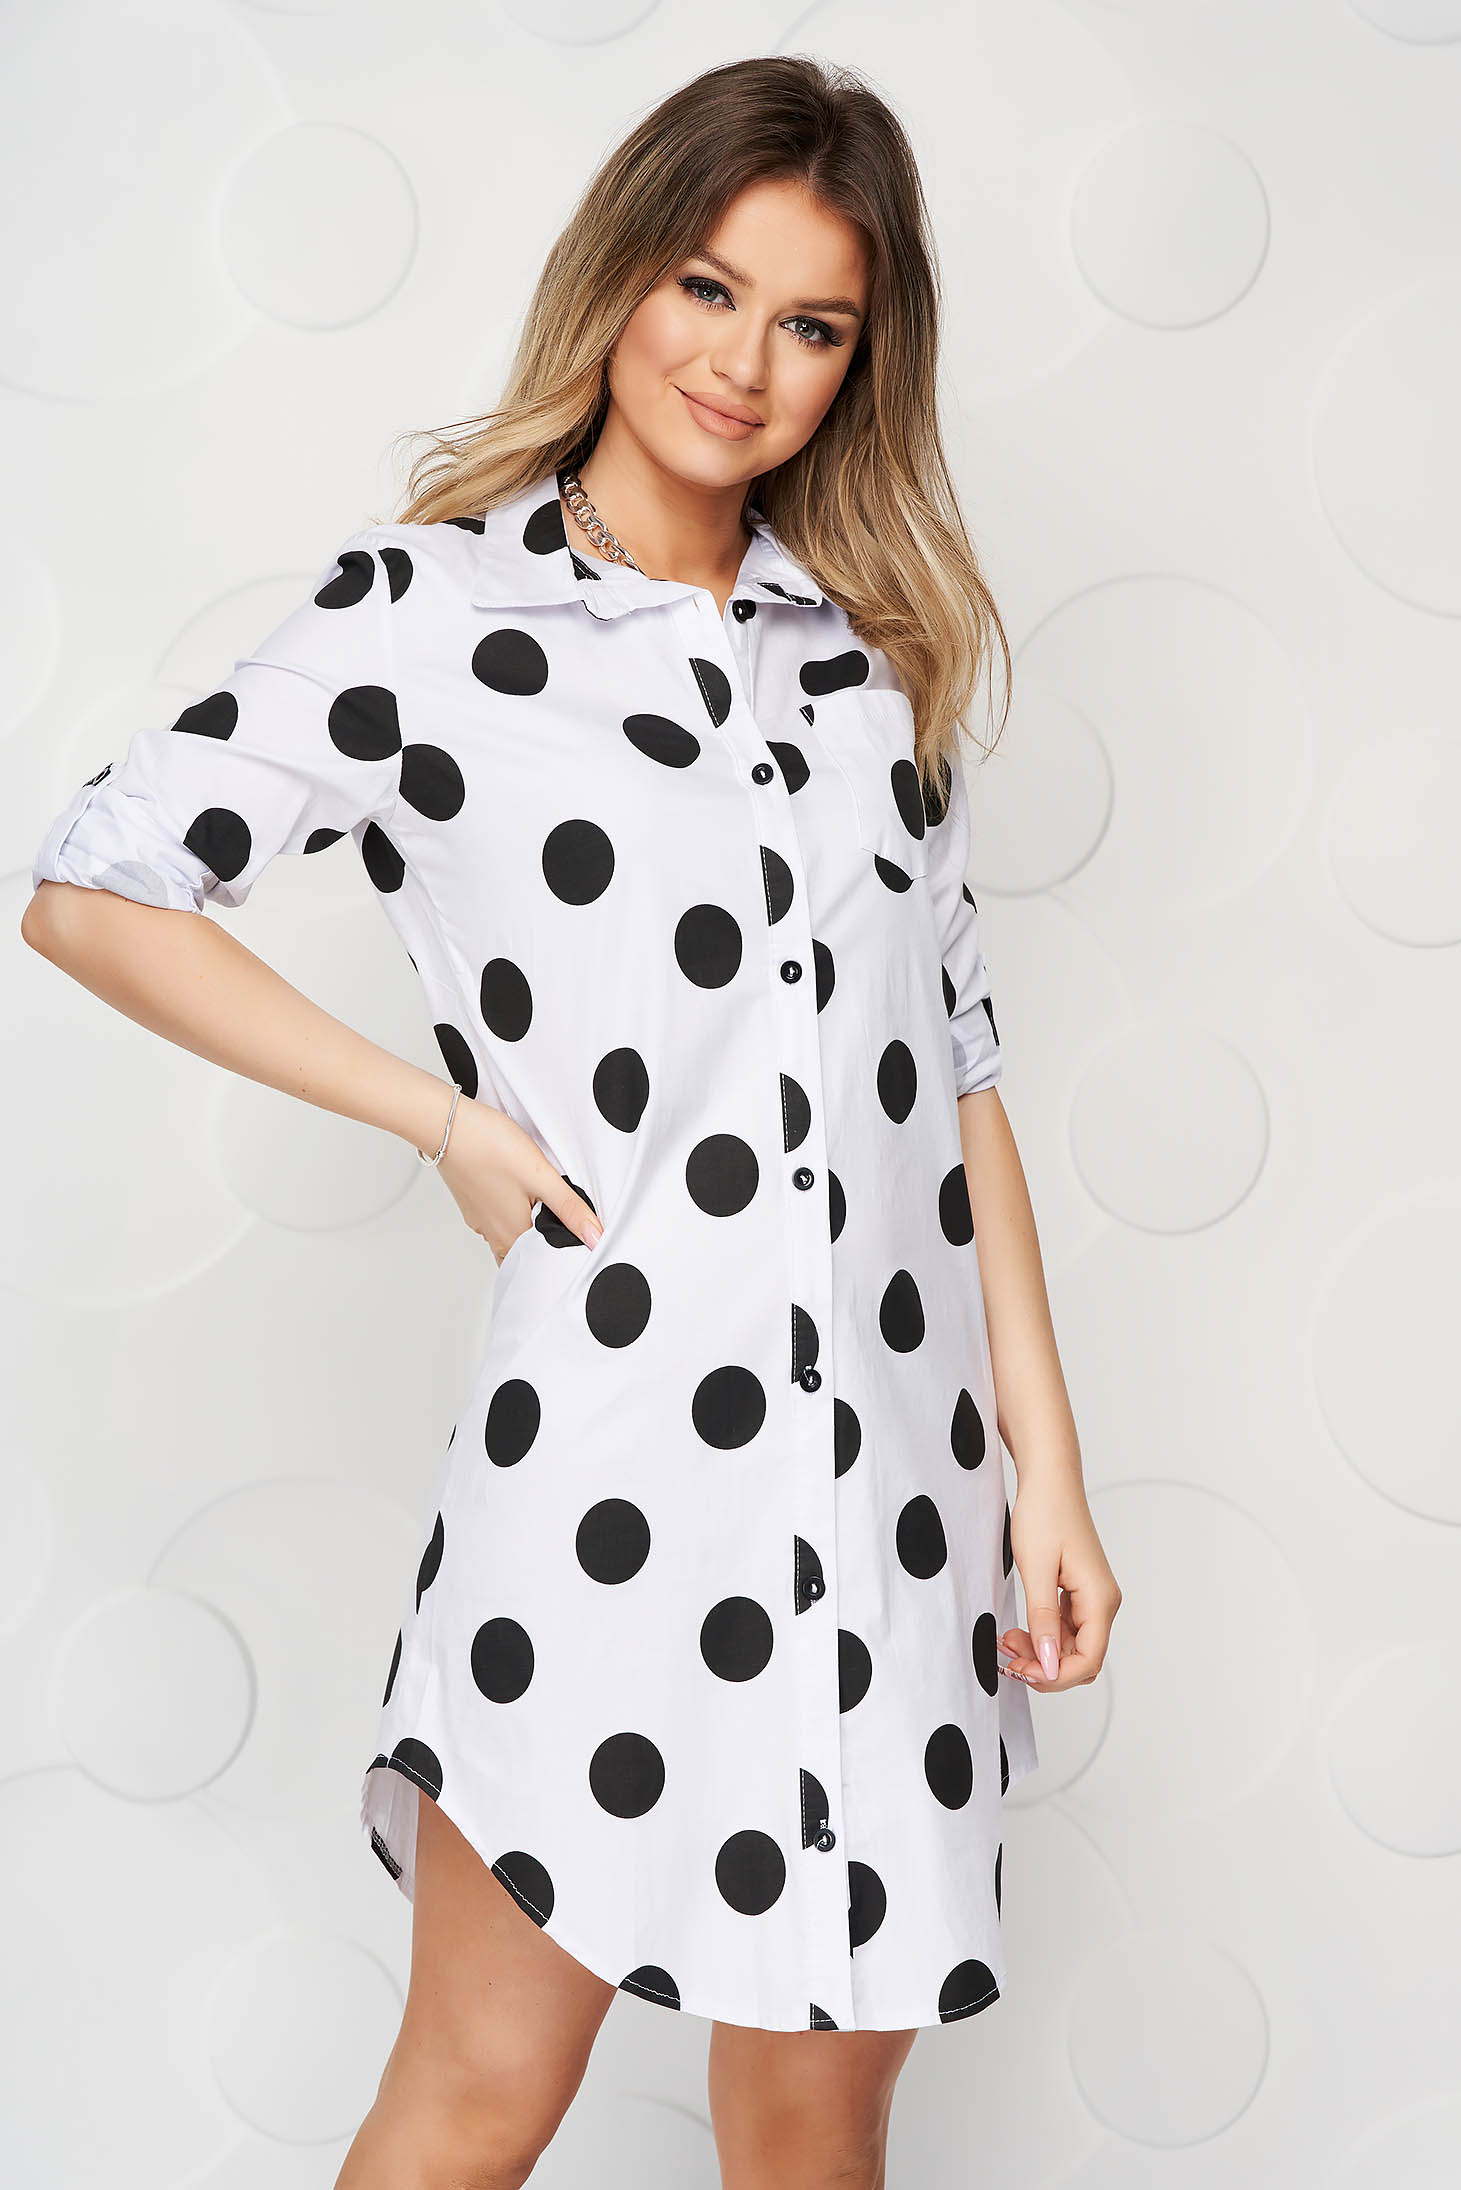 White dress dots print poplin, thin cotton asymmetrical straight